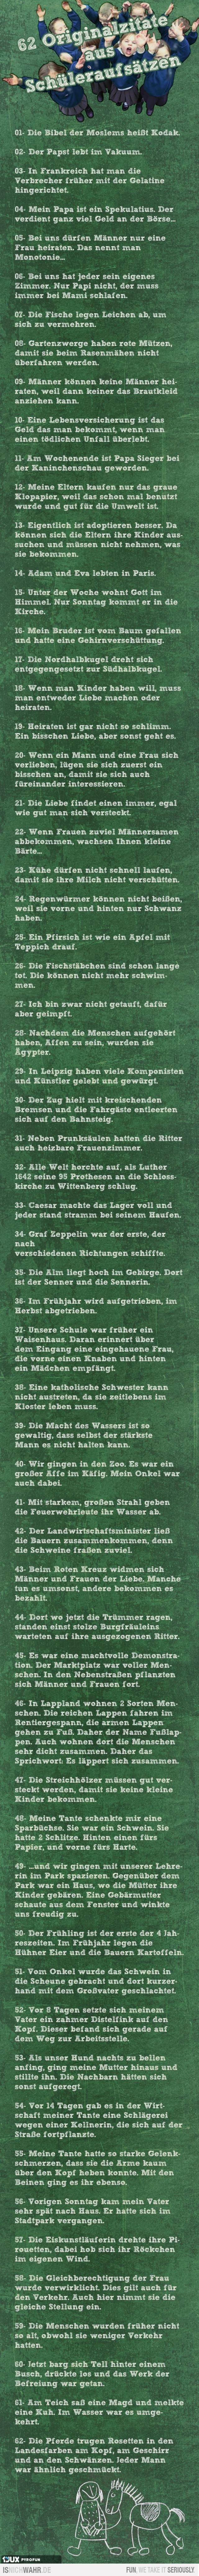 iNW-LiVE Daily Picdump #240314 - Fun Pics bei iSNiCHWAHR.de